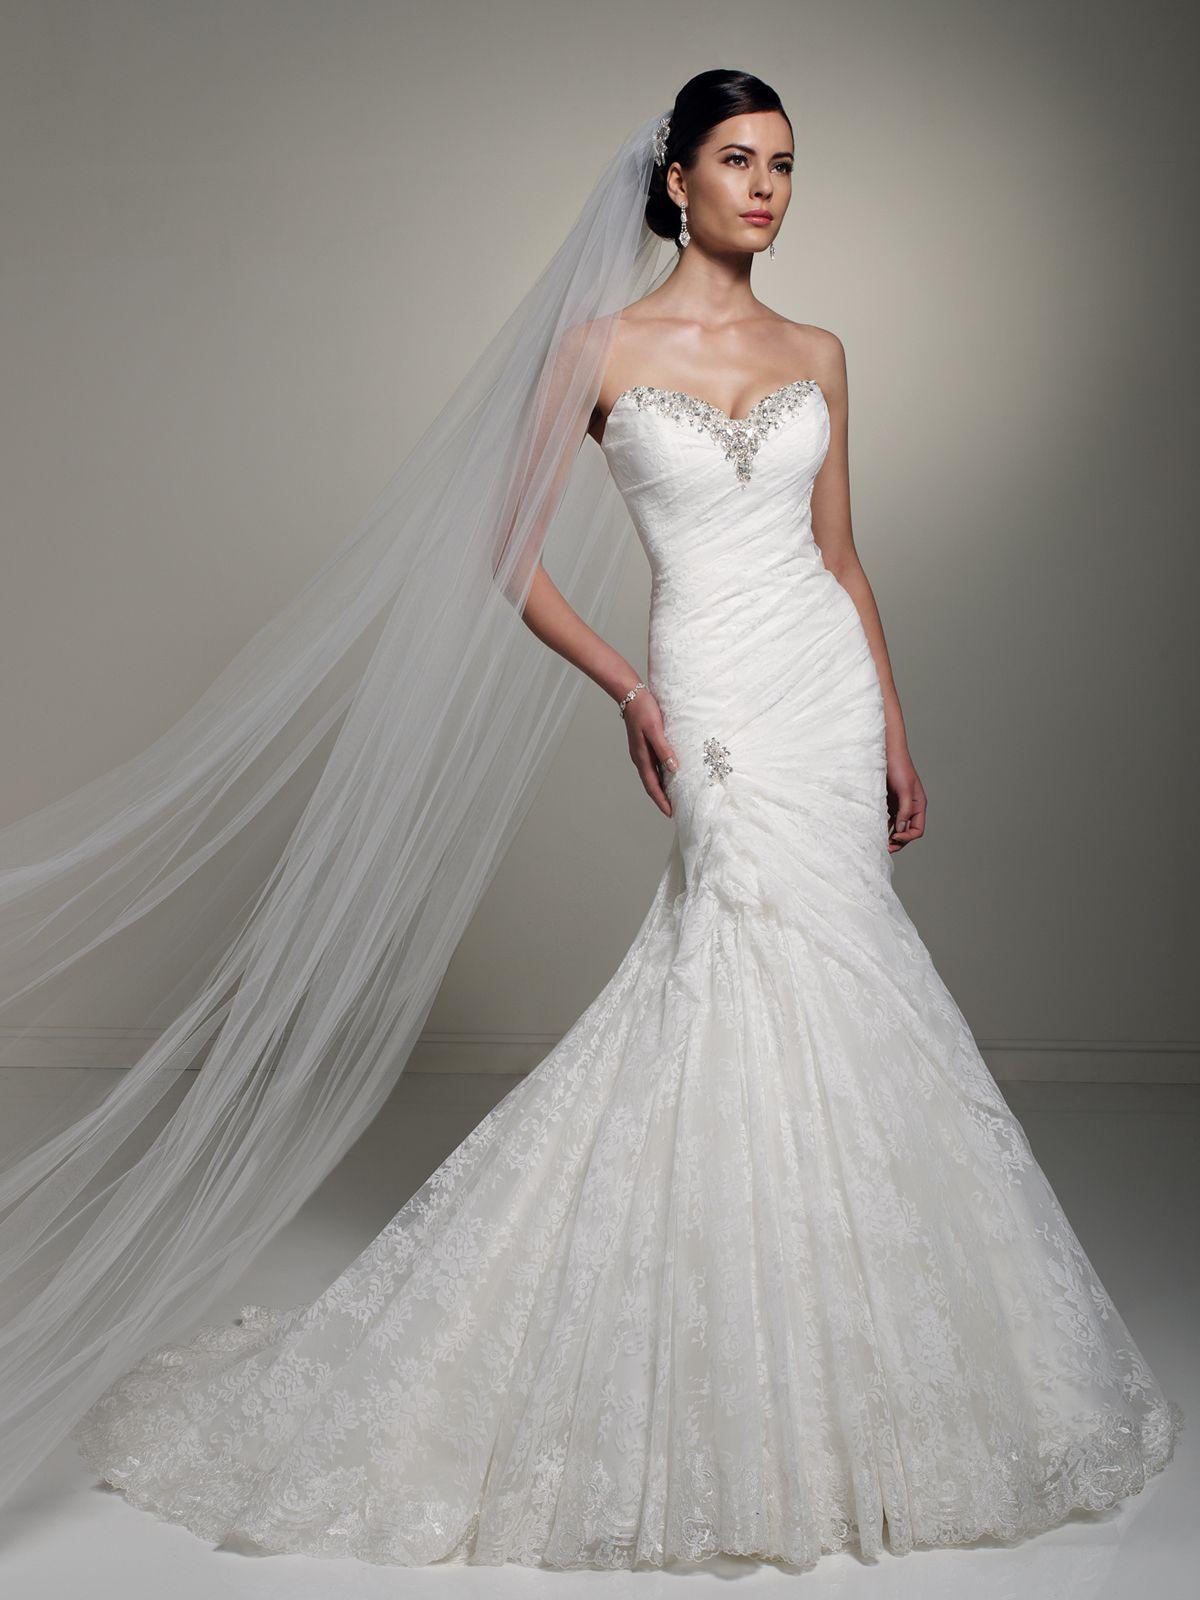 Sophia tolli olga y wedding dresses pinterest wedding